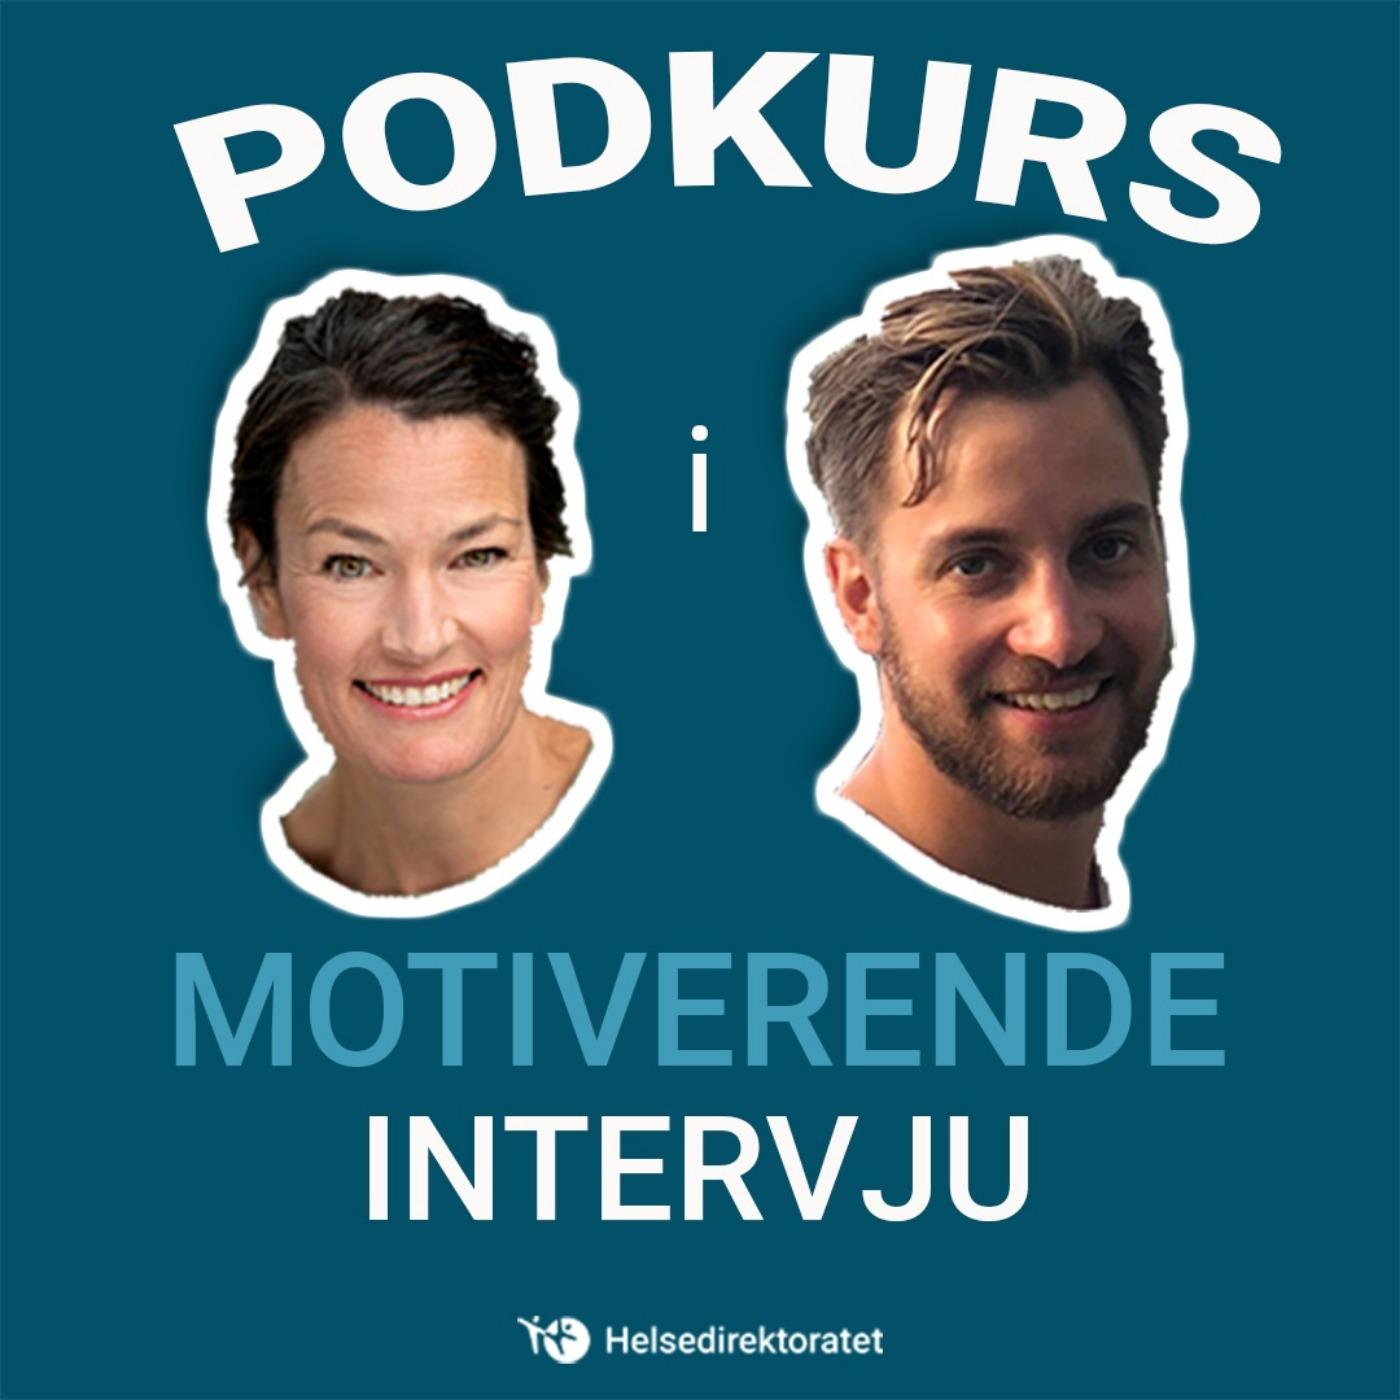 Ep #1: Motiverende intervju - en innføring